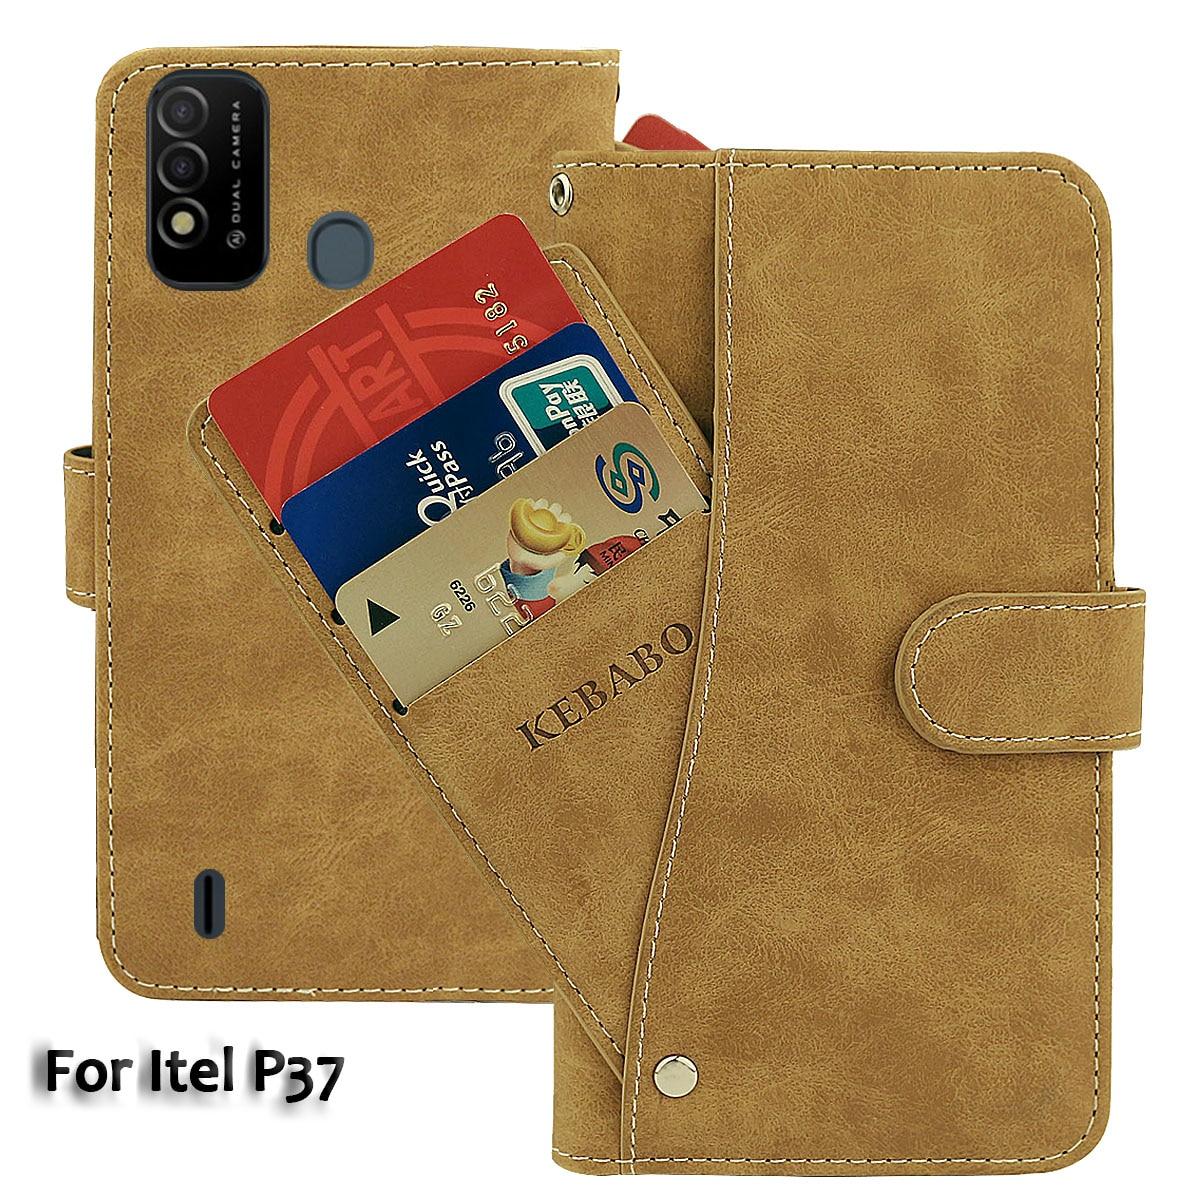 Vintage Leather Wallet Itel P37 Case 6.5